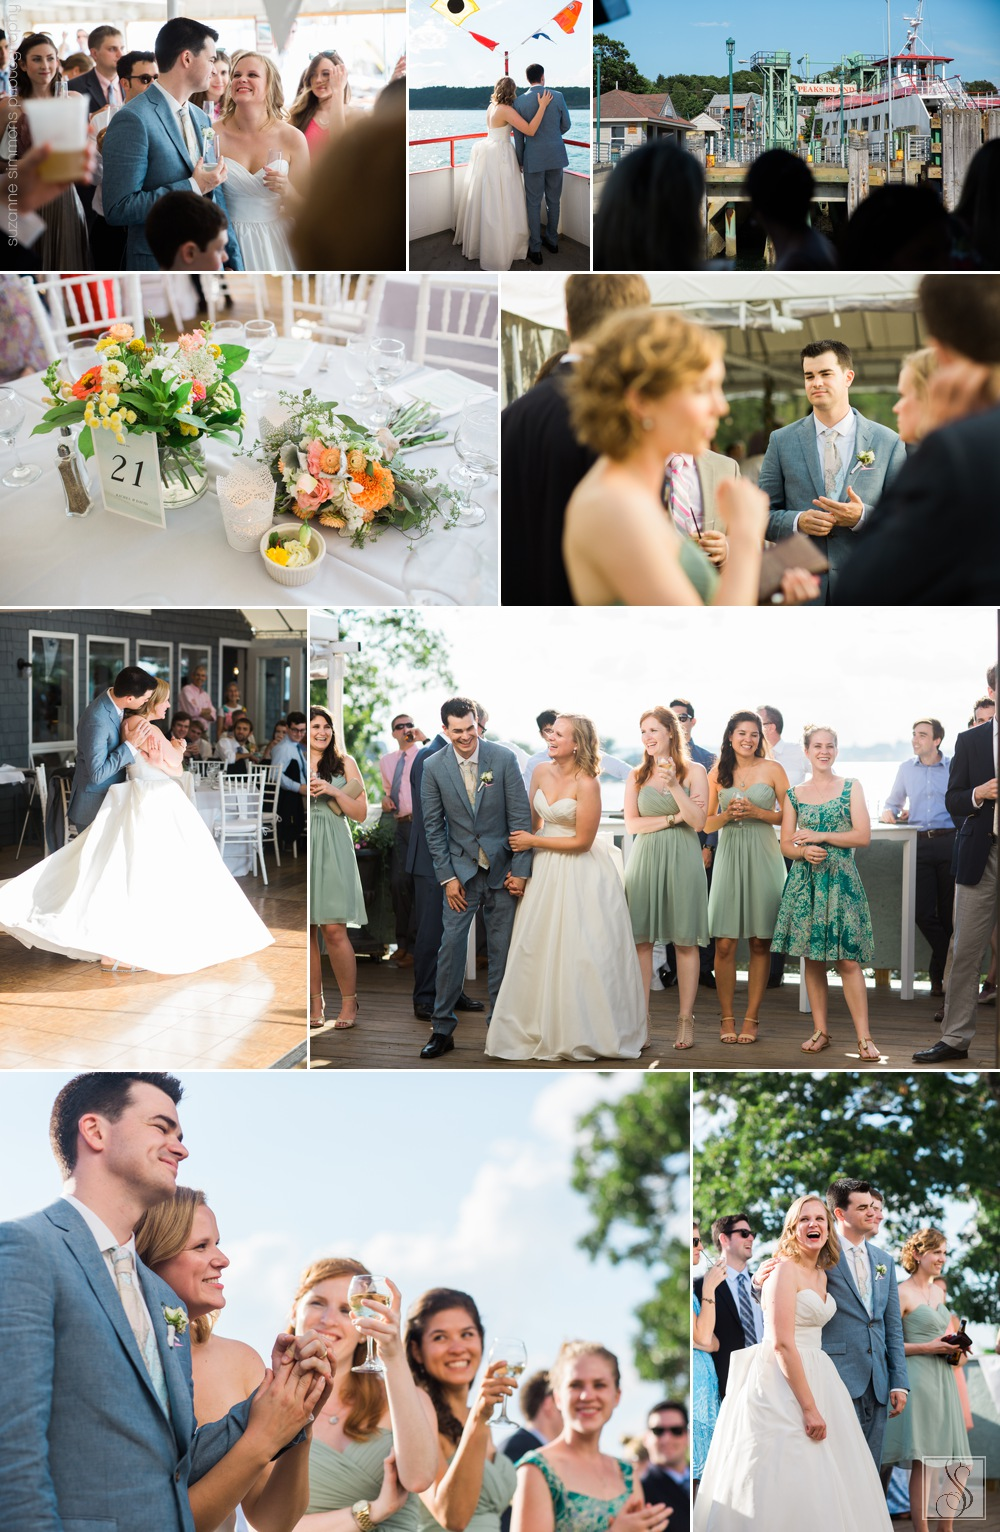 Wedding reception at Jones Landing on Peaks Island